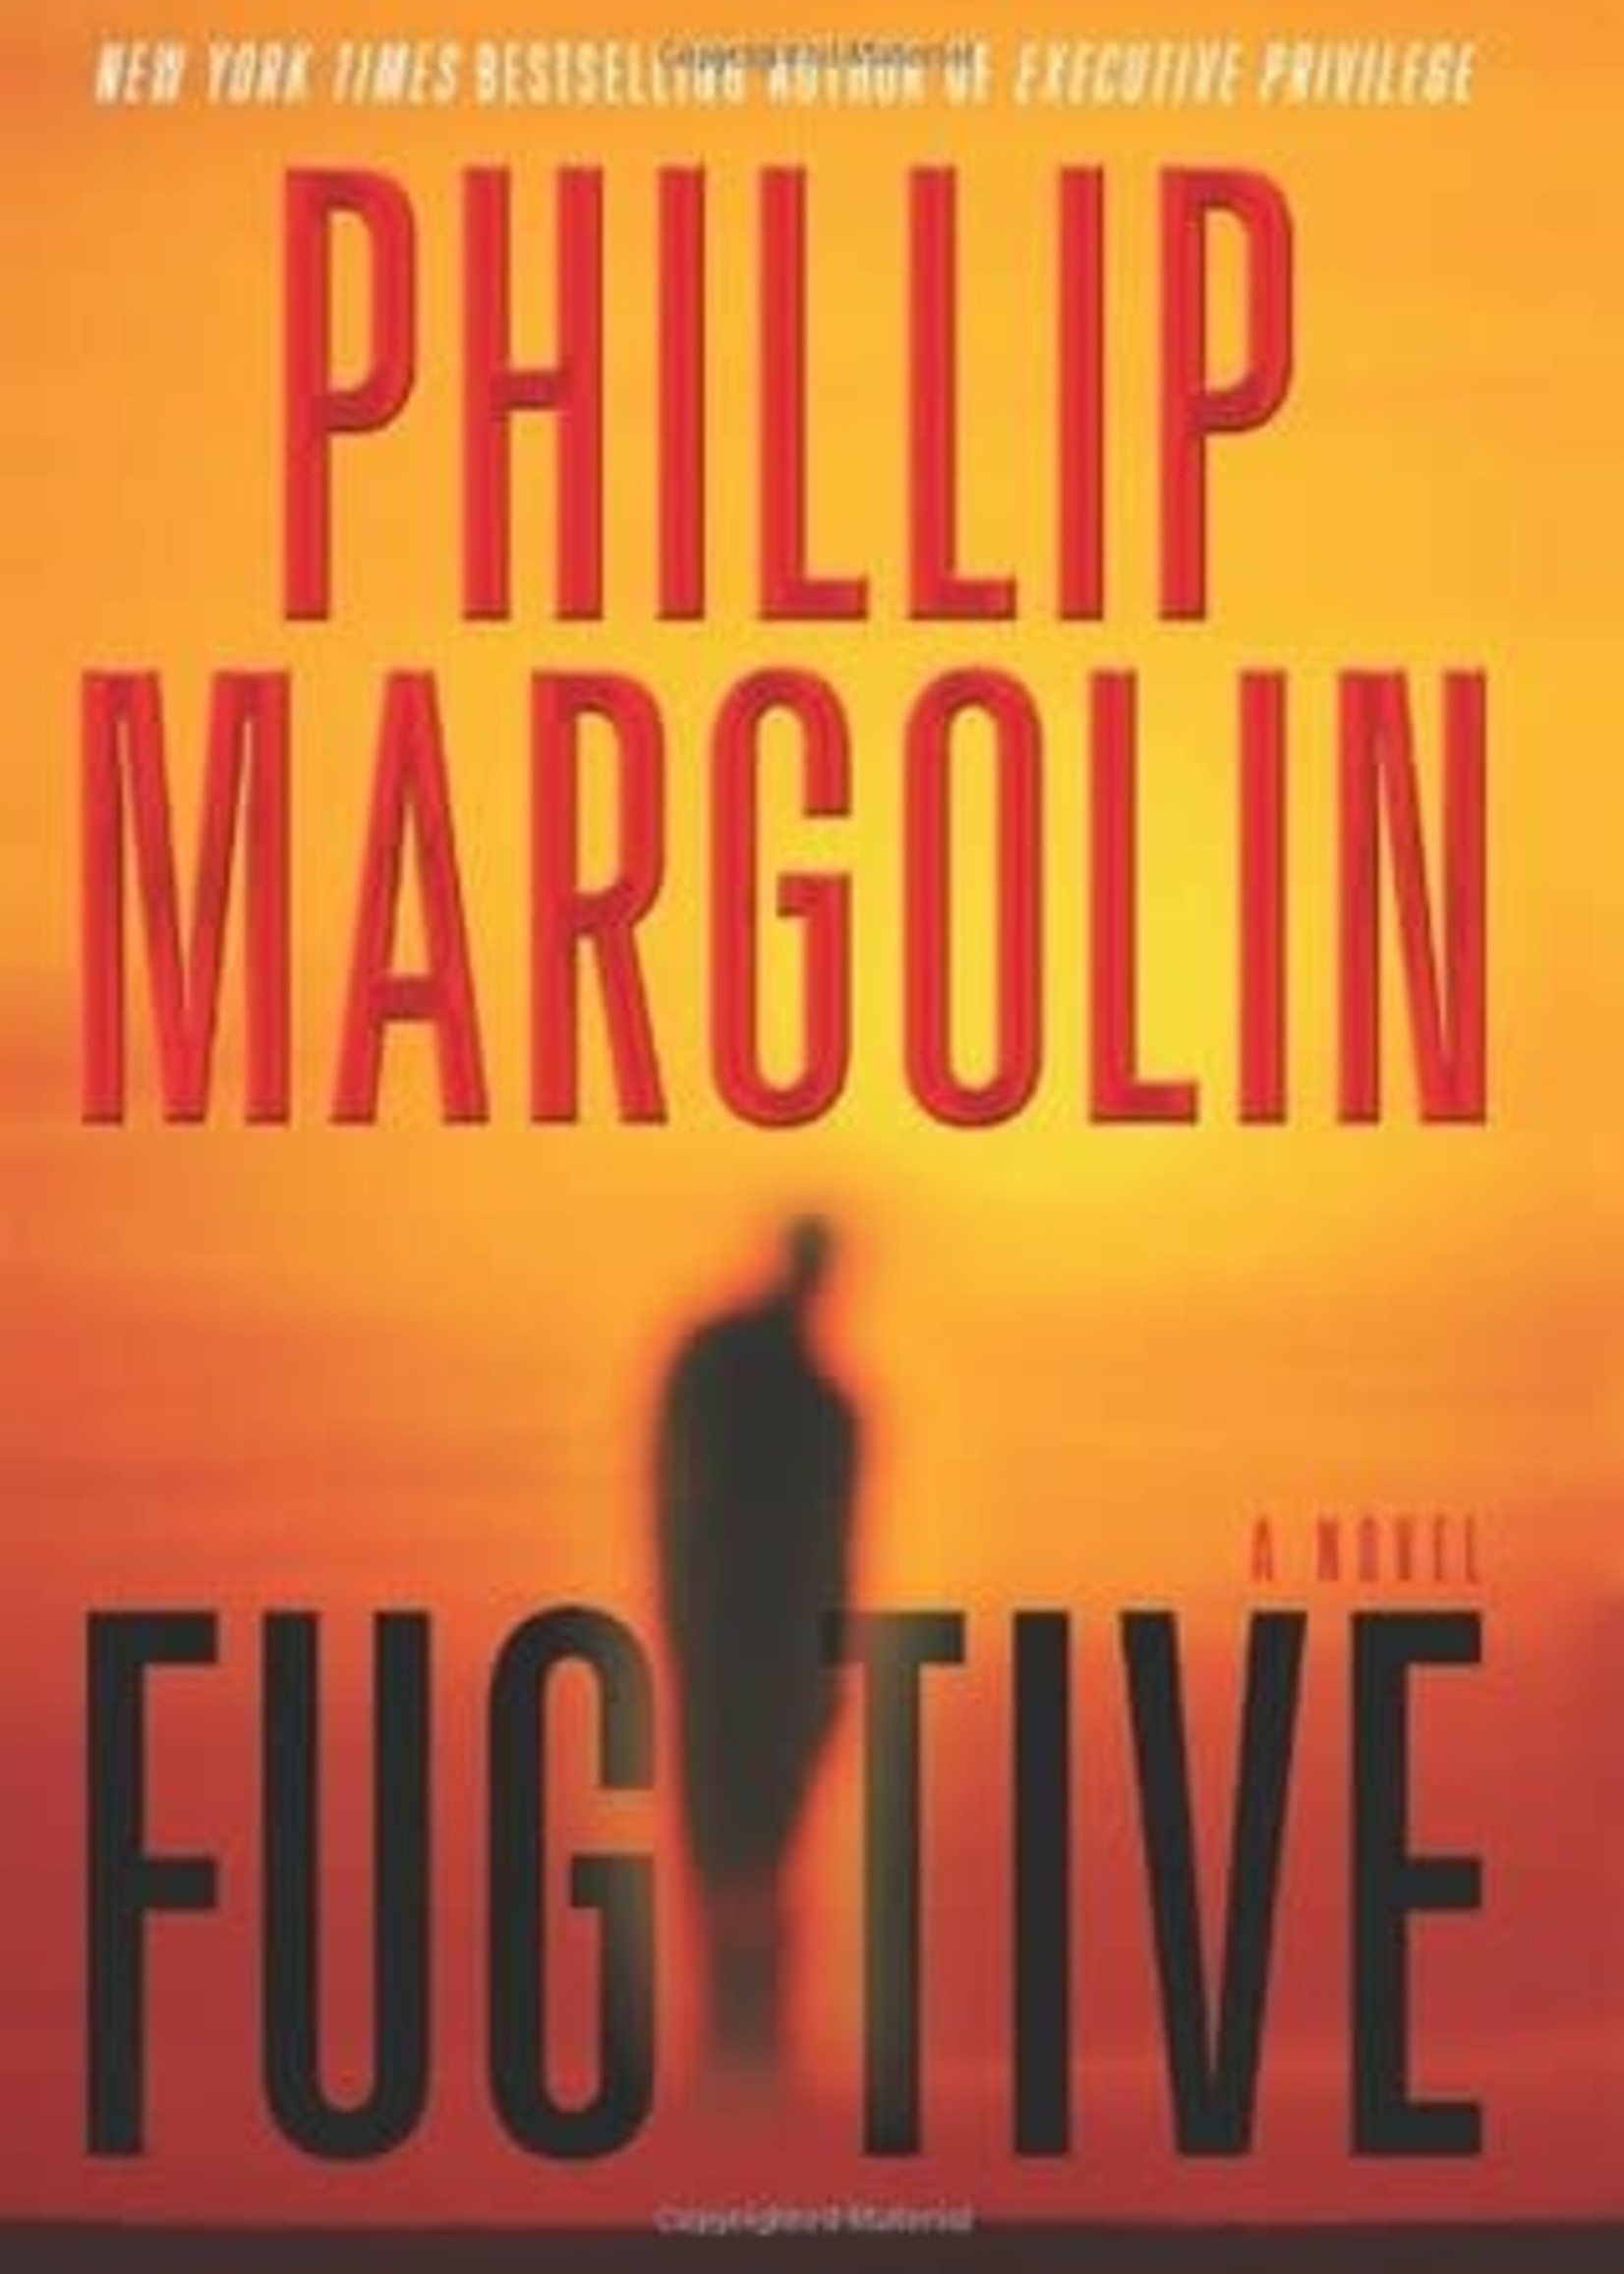 USED - Fugitive by Phillip Margolin